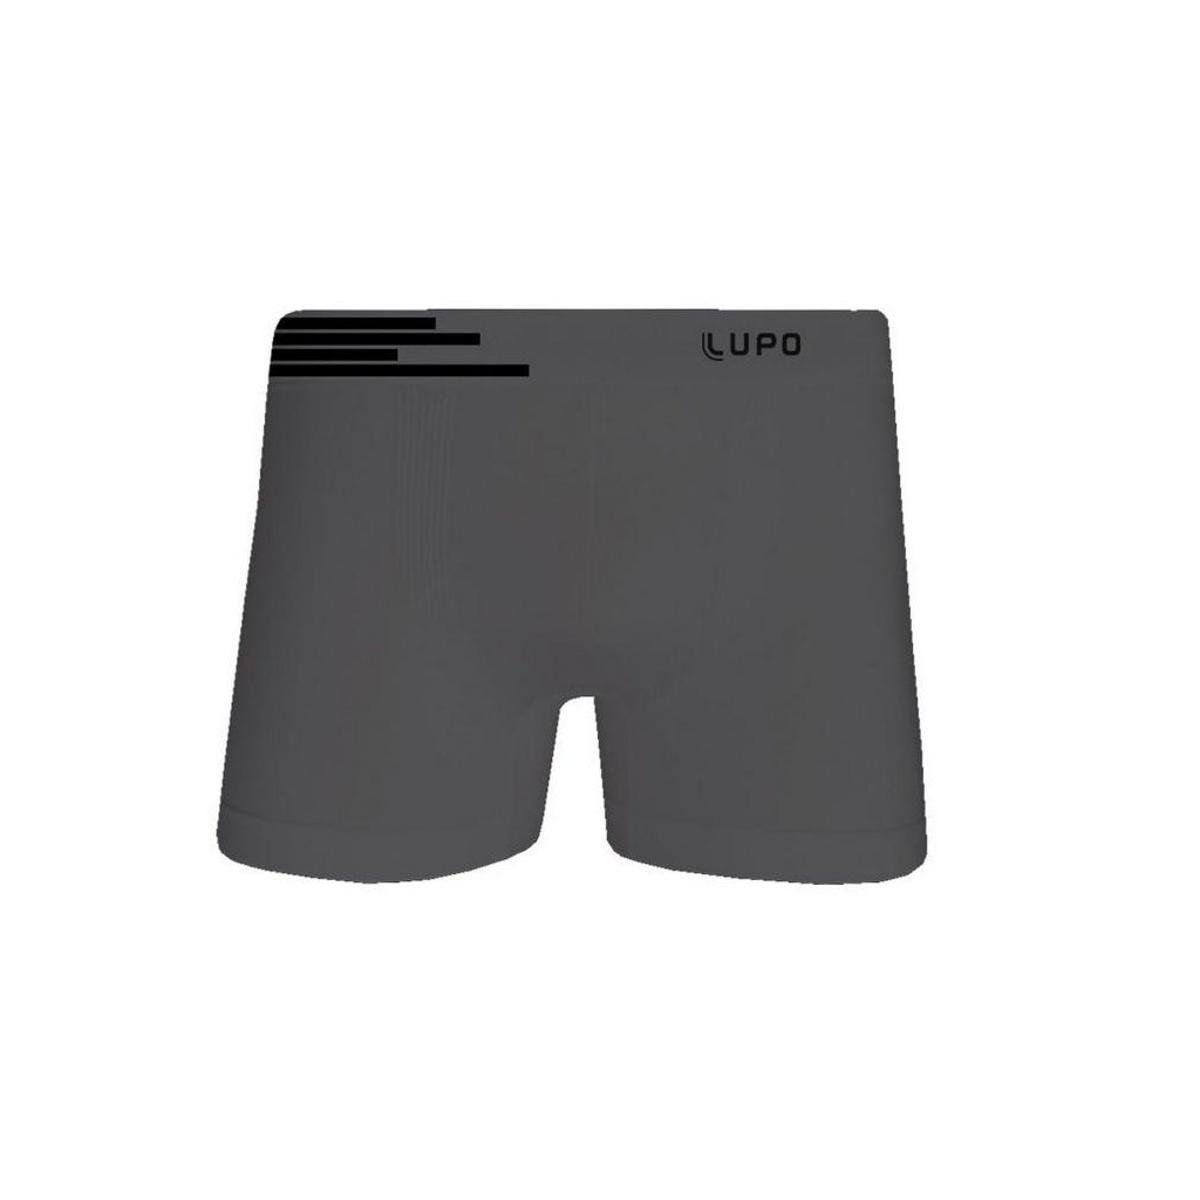 Kit 2 Cuecas Boxer Lupo Sem Costura Microfibra - Cor Branca e Cinza